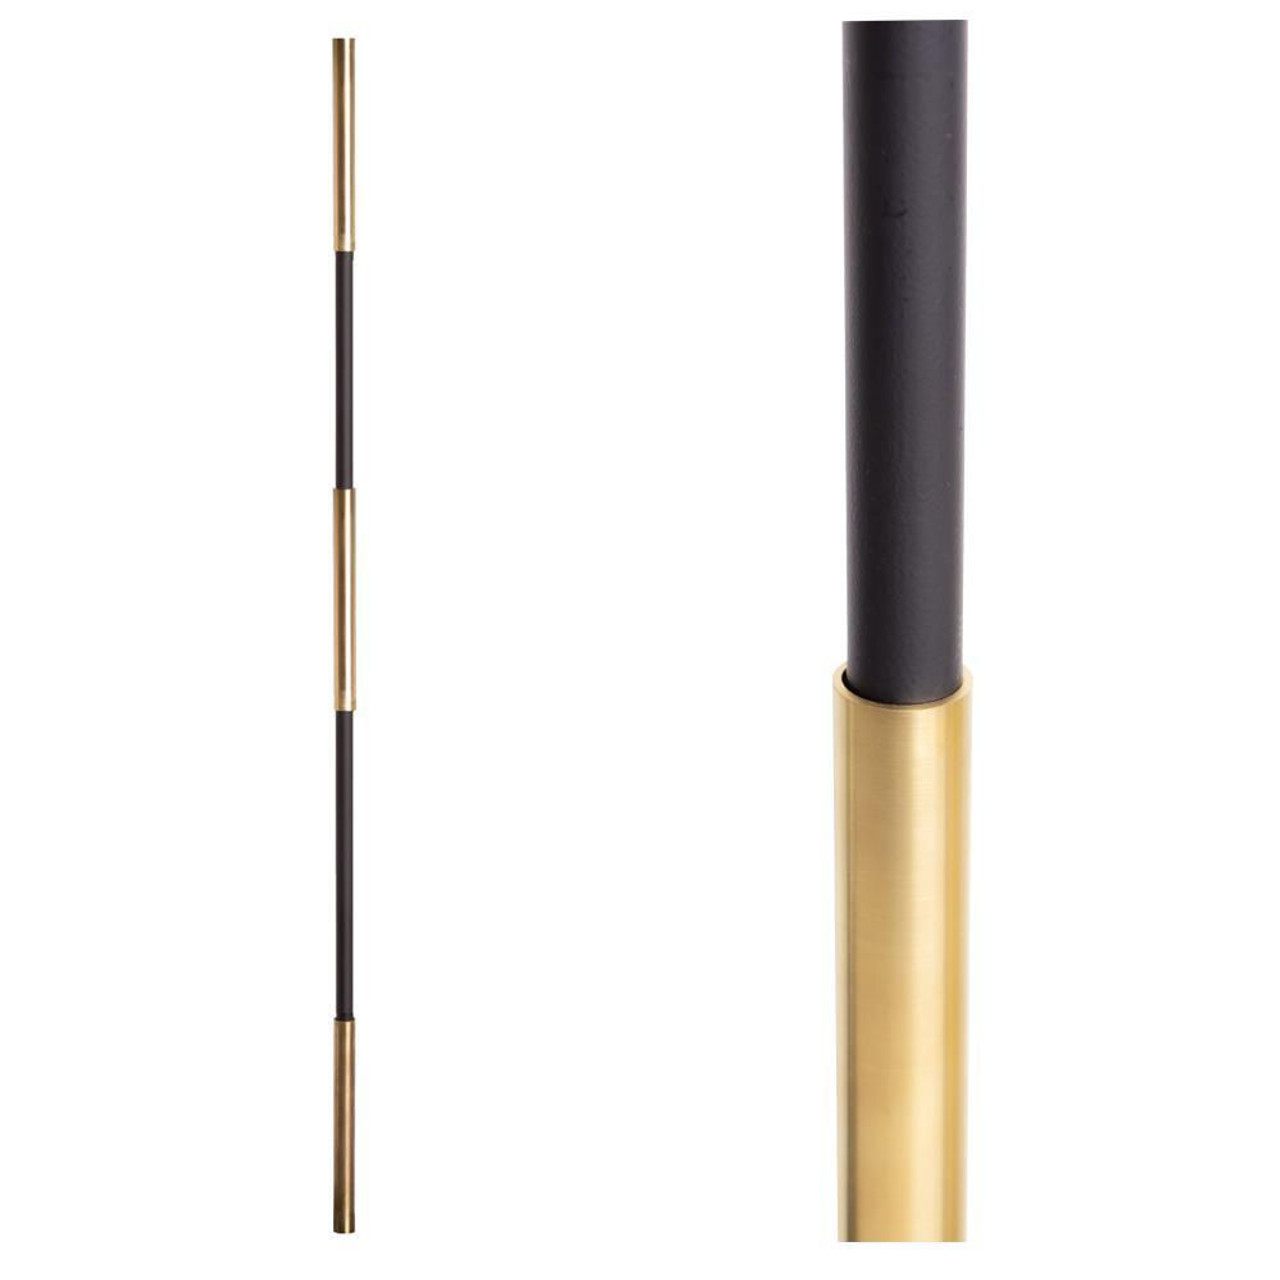 SoHo - Brass Base on Satin Black Baluster (18.4.1) Three Sleeves